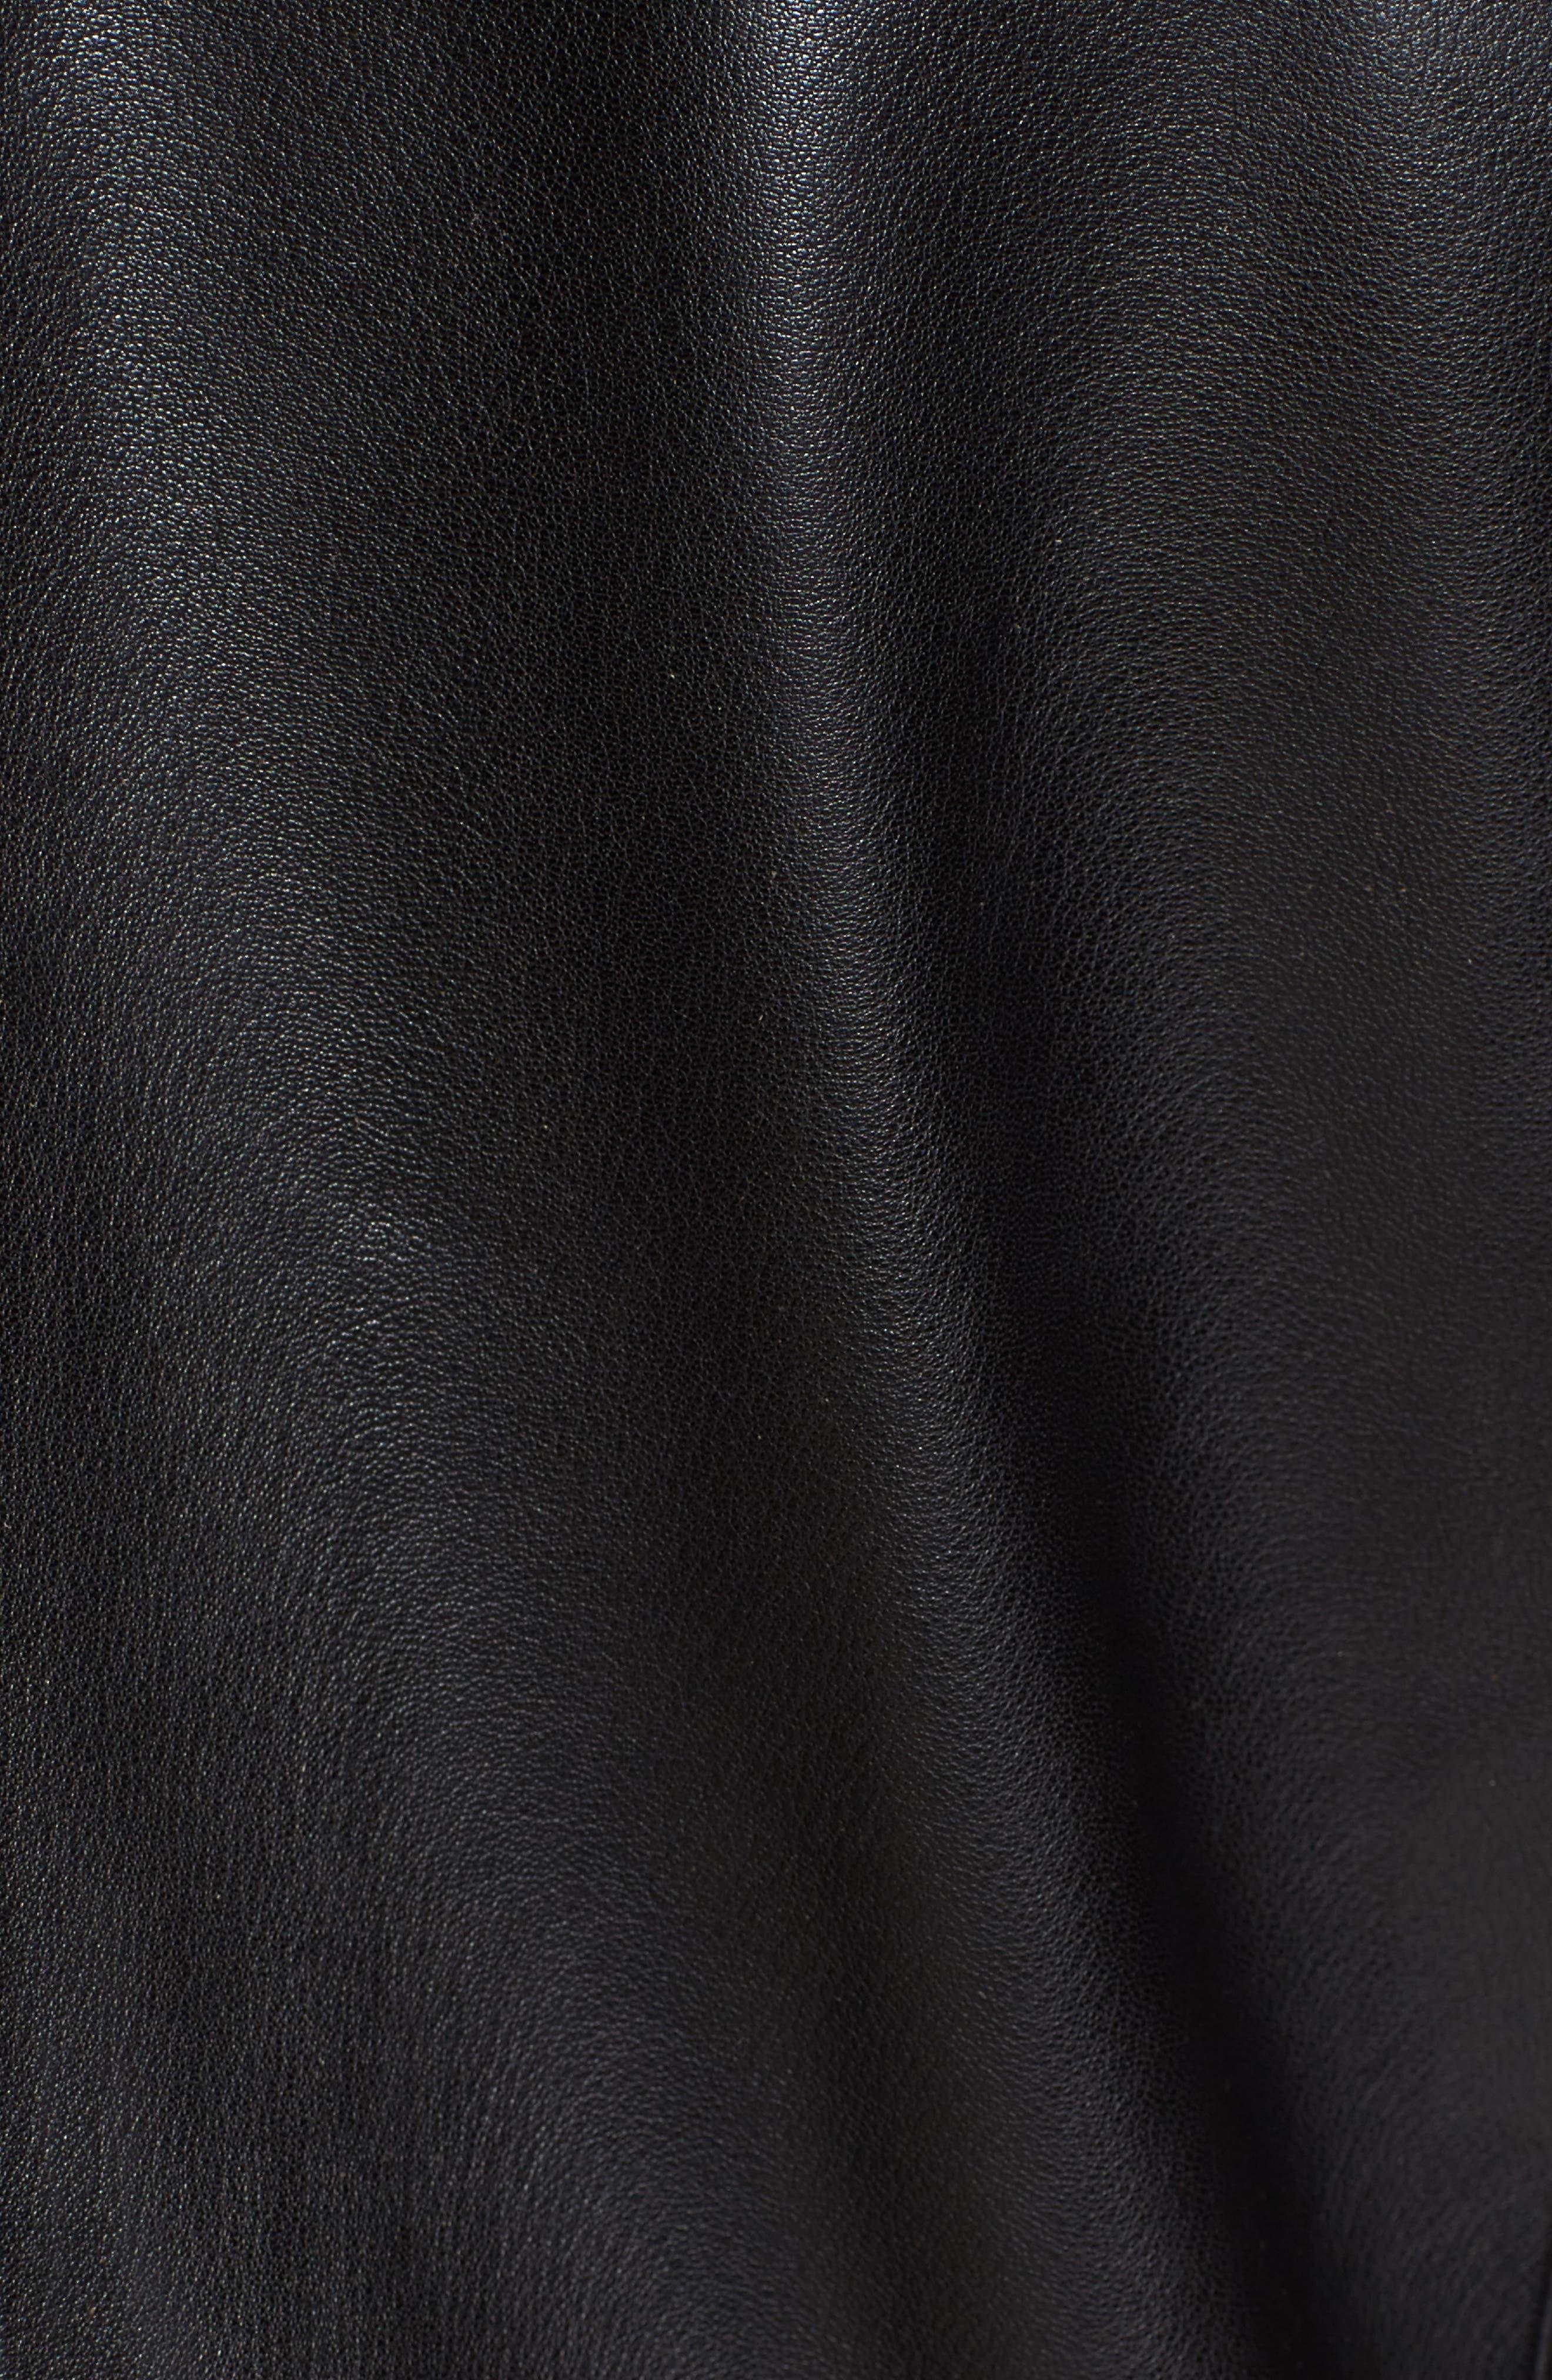 Washed Leather Jacket,                             Alternate thumbnail 4, color,                             Black